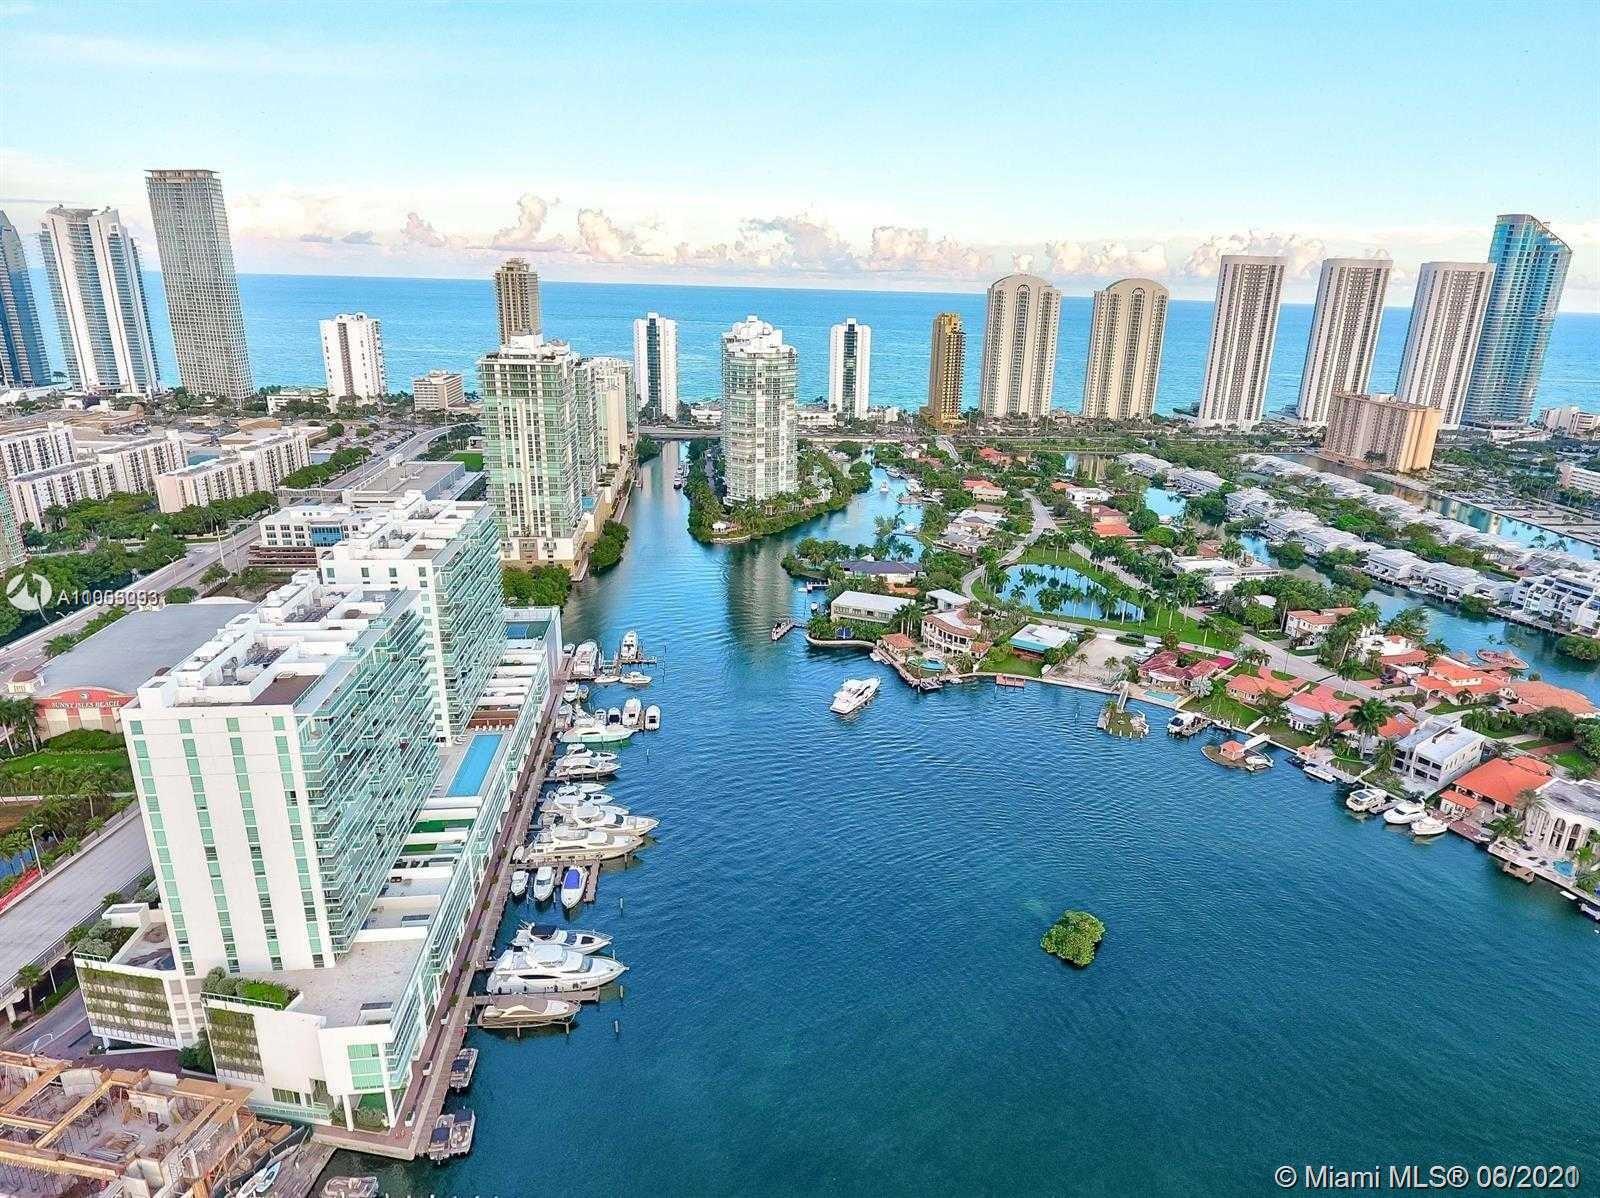 400 Sunny Isles #1708 - 400 Sunny Isles Blvd #1708, Sunny Isles Beach, FL 33160